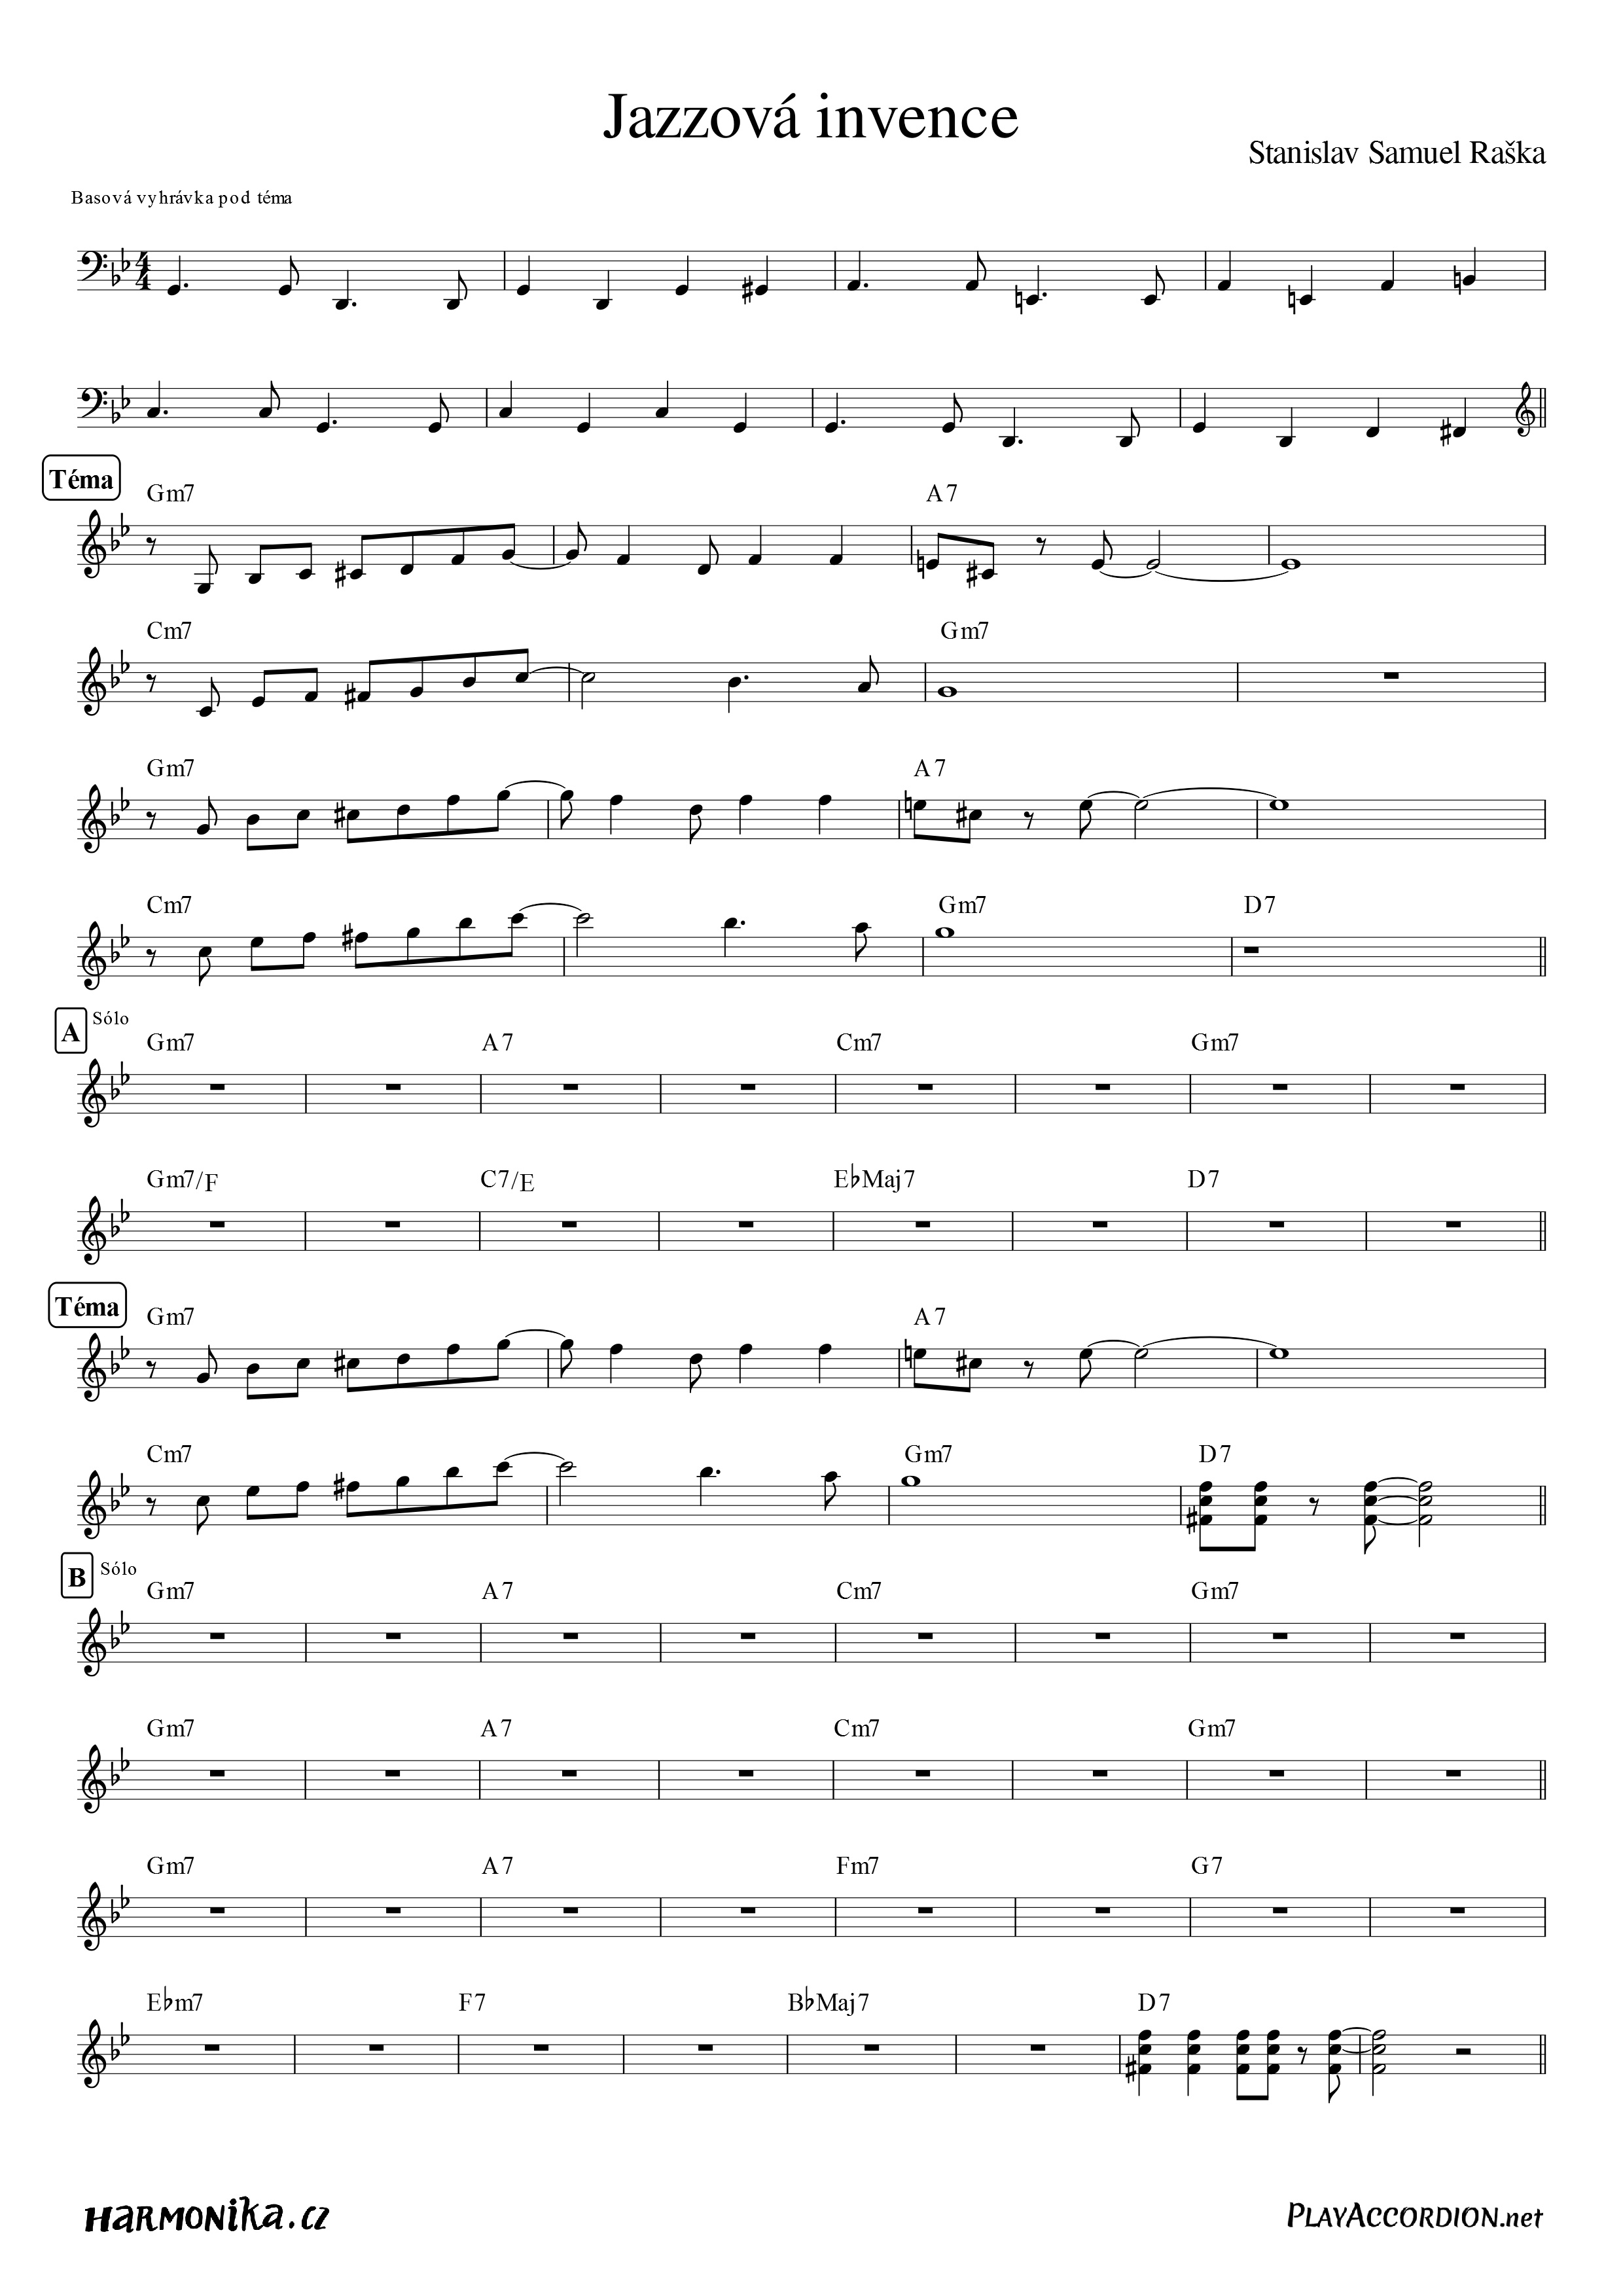 jazzova-invence_celek-1